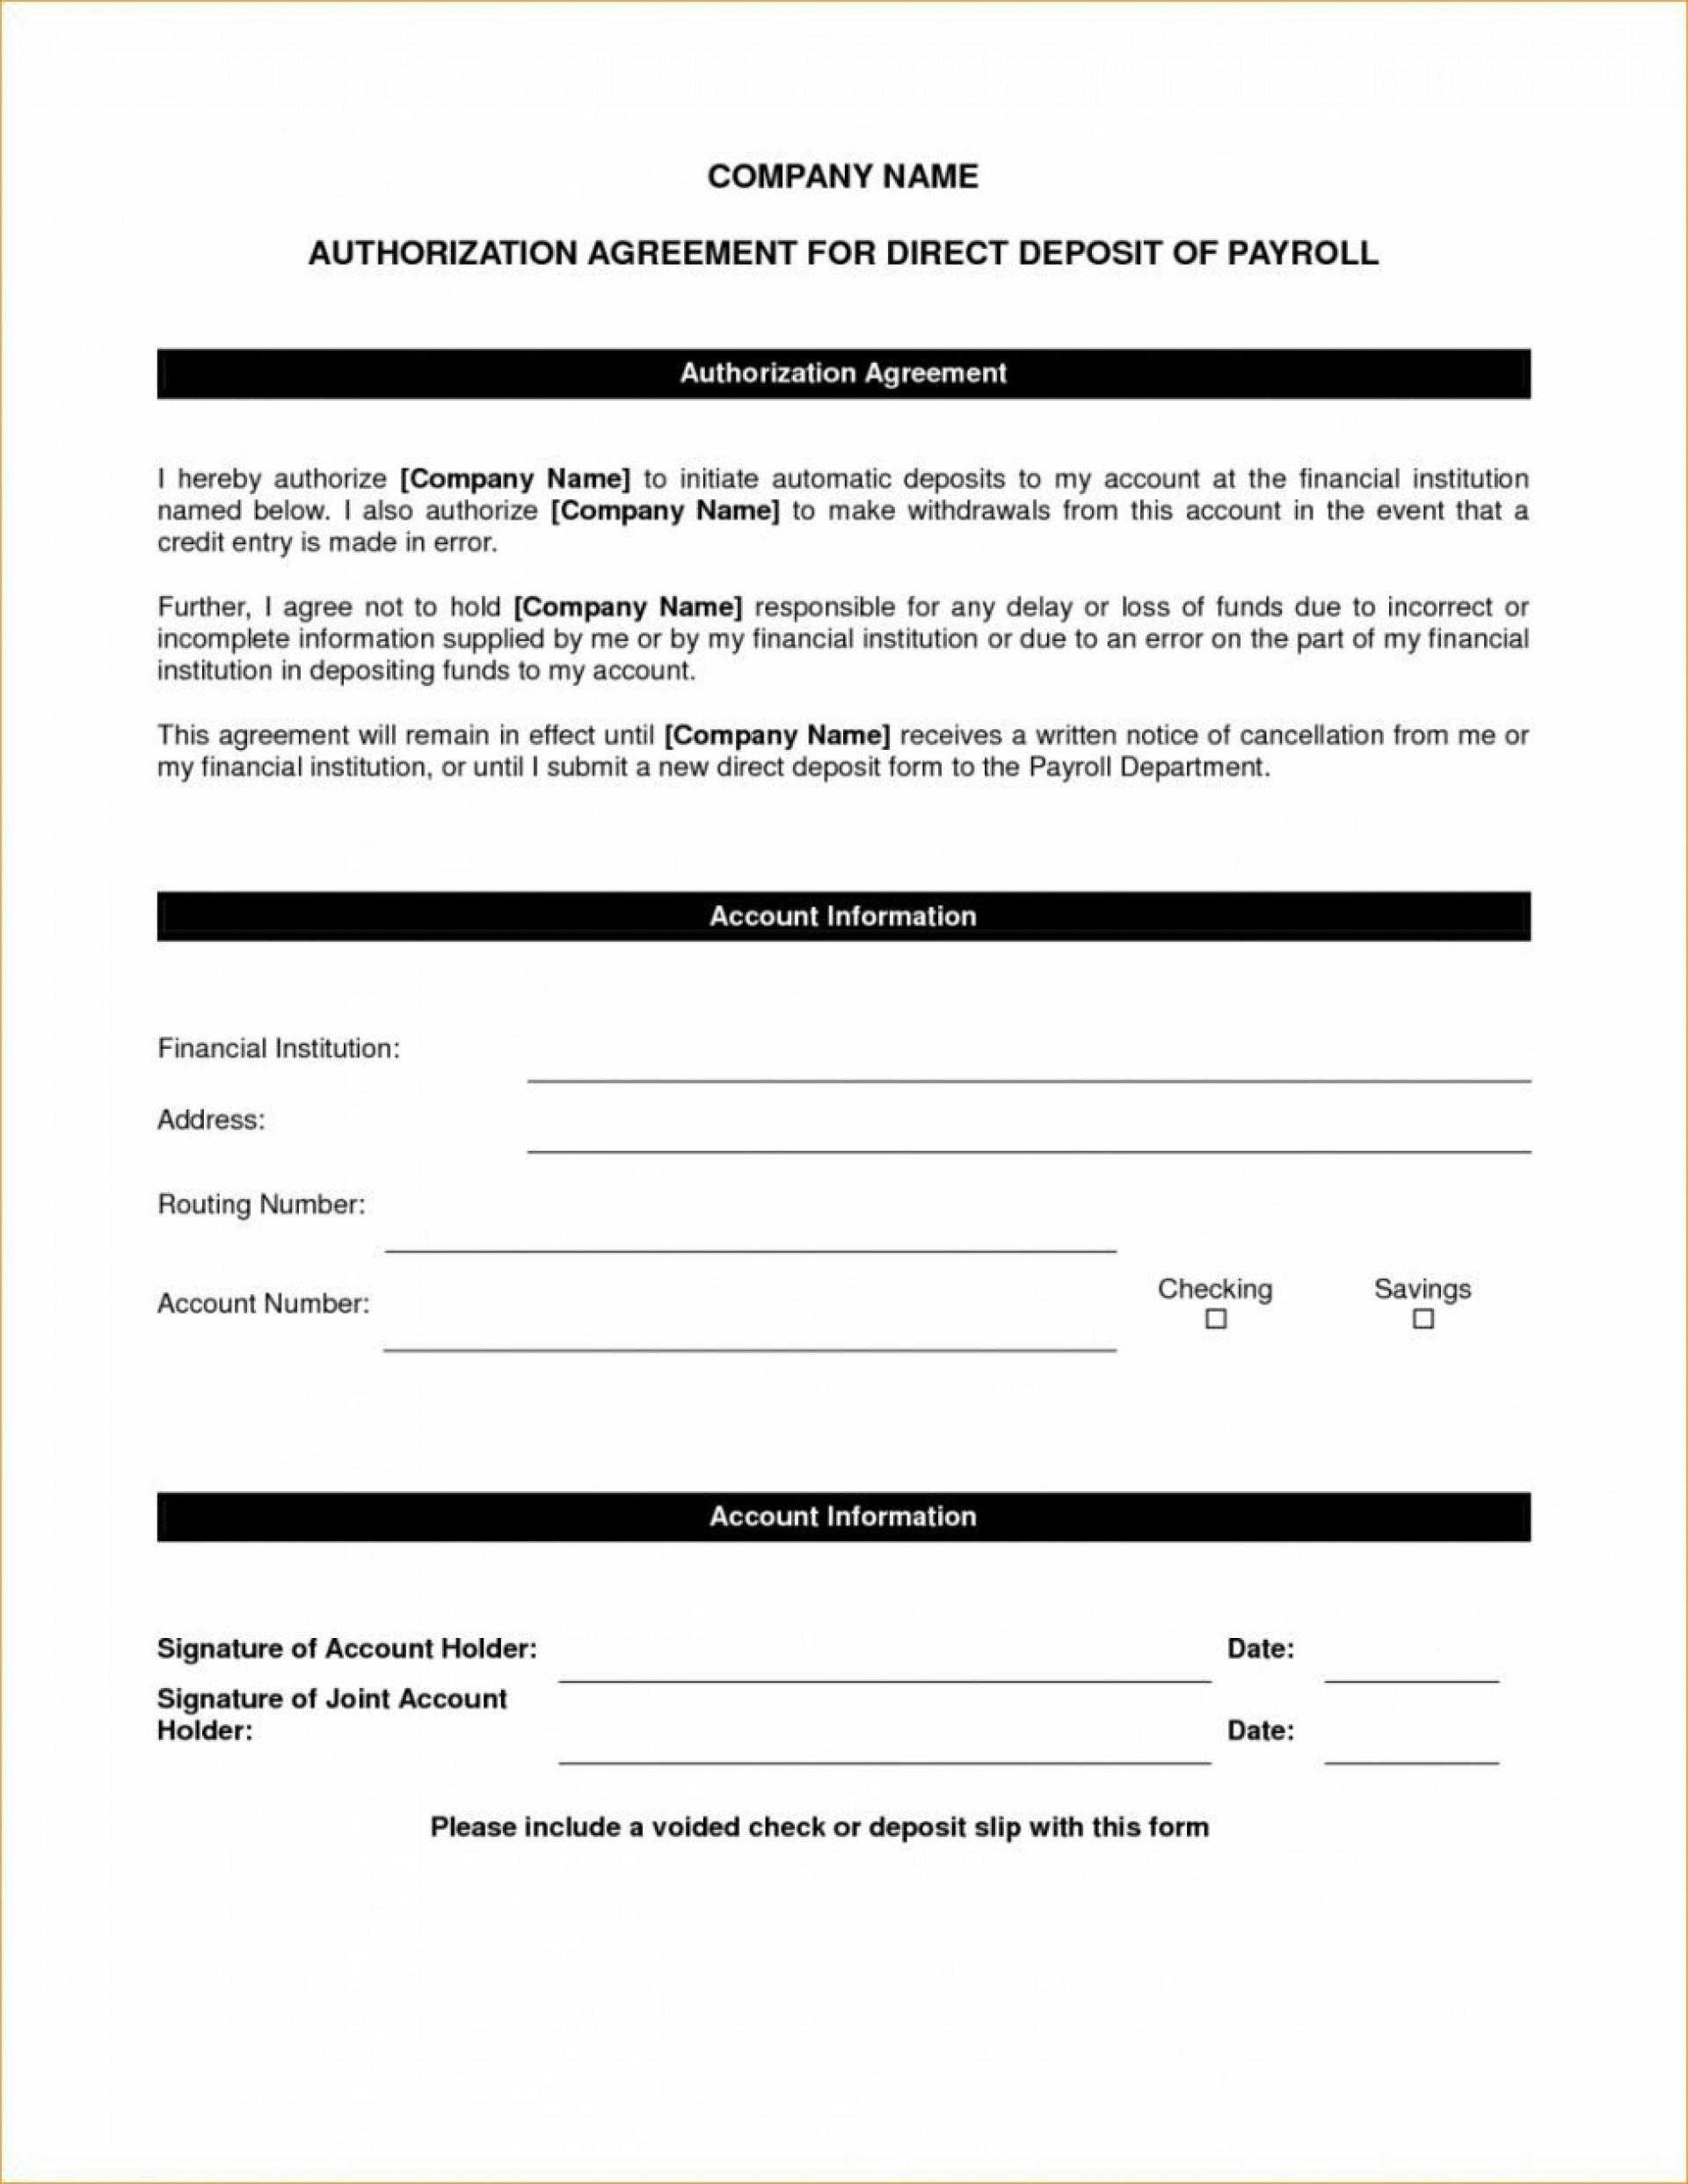 006 Unbelievable Direct Deposit Agreement Authorization Form Template Photo 1920